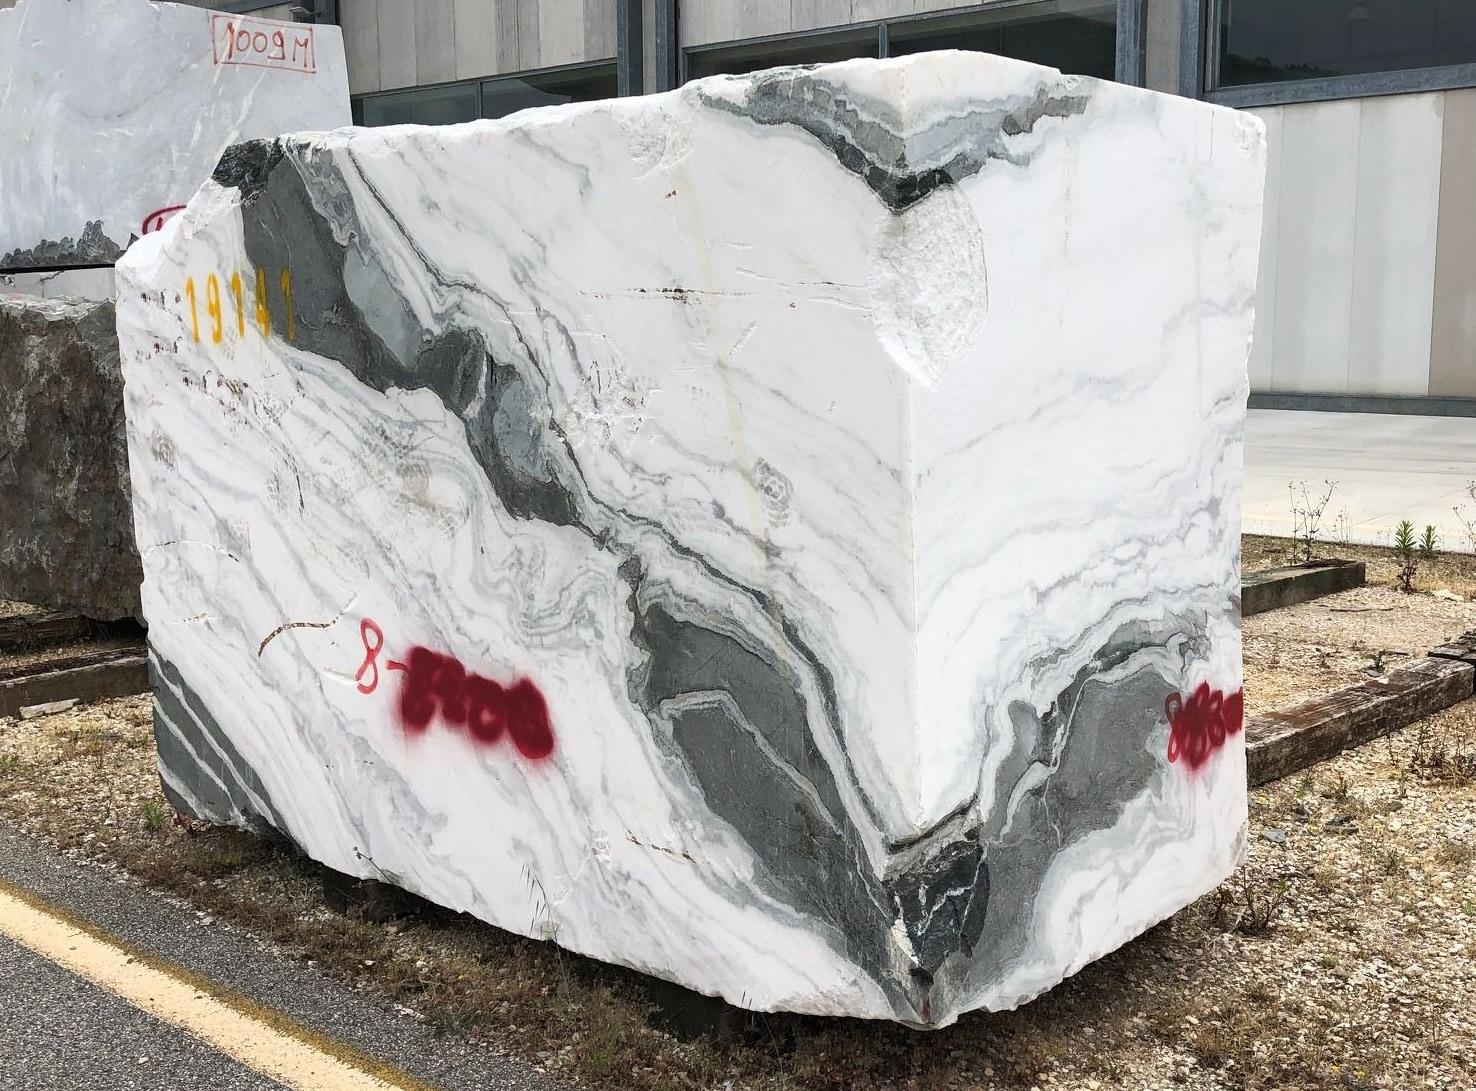 PANDA rohe Blöcke 1517M aus Natur Marmor: Lieferung, Italien